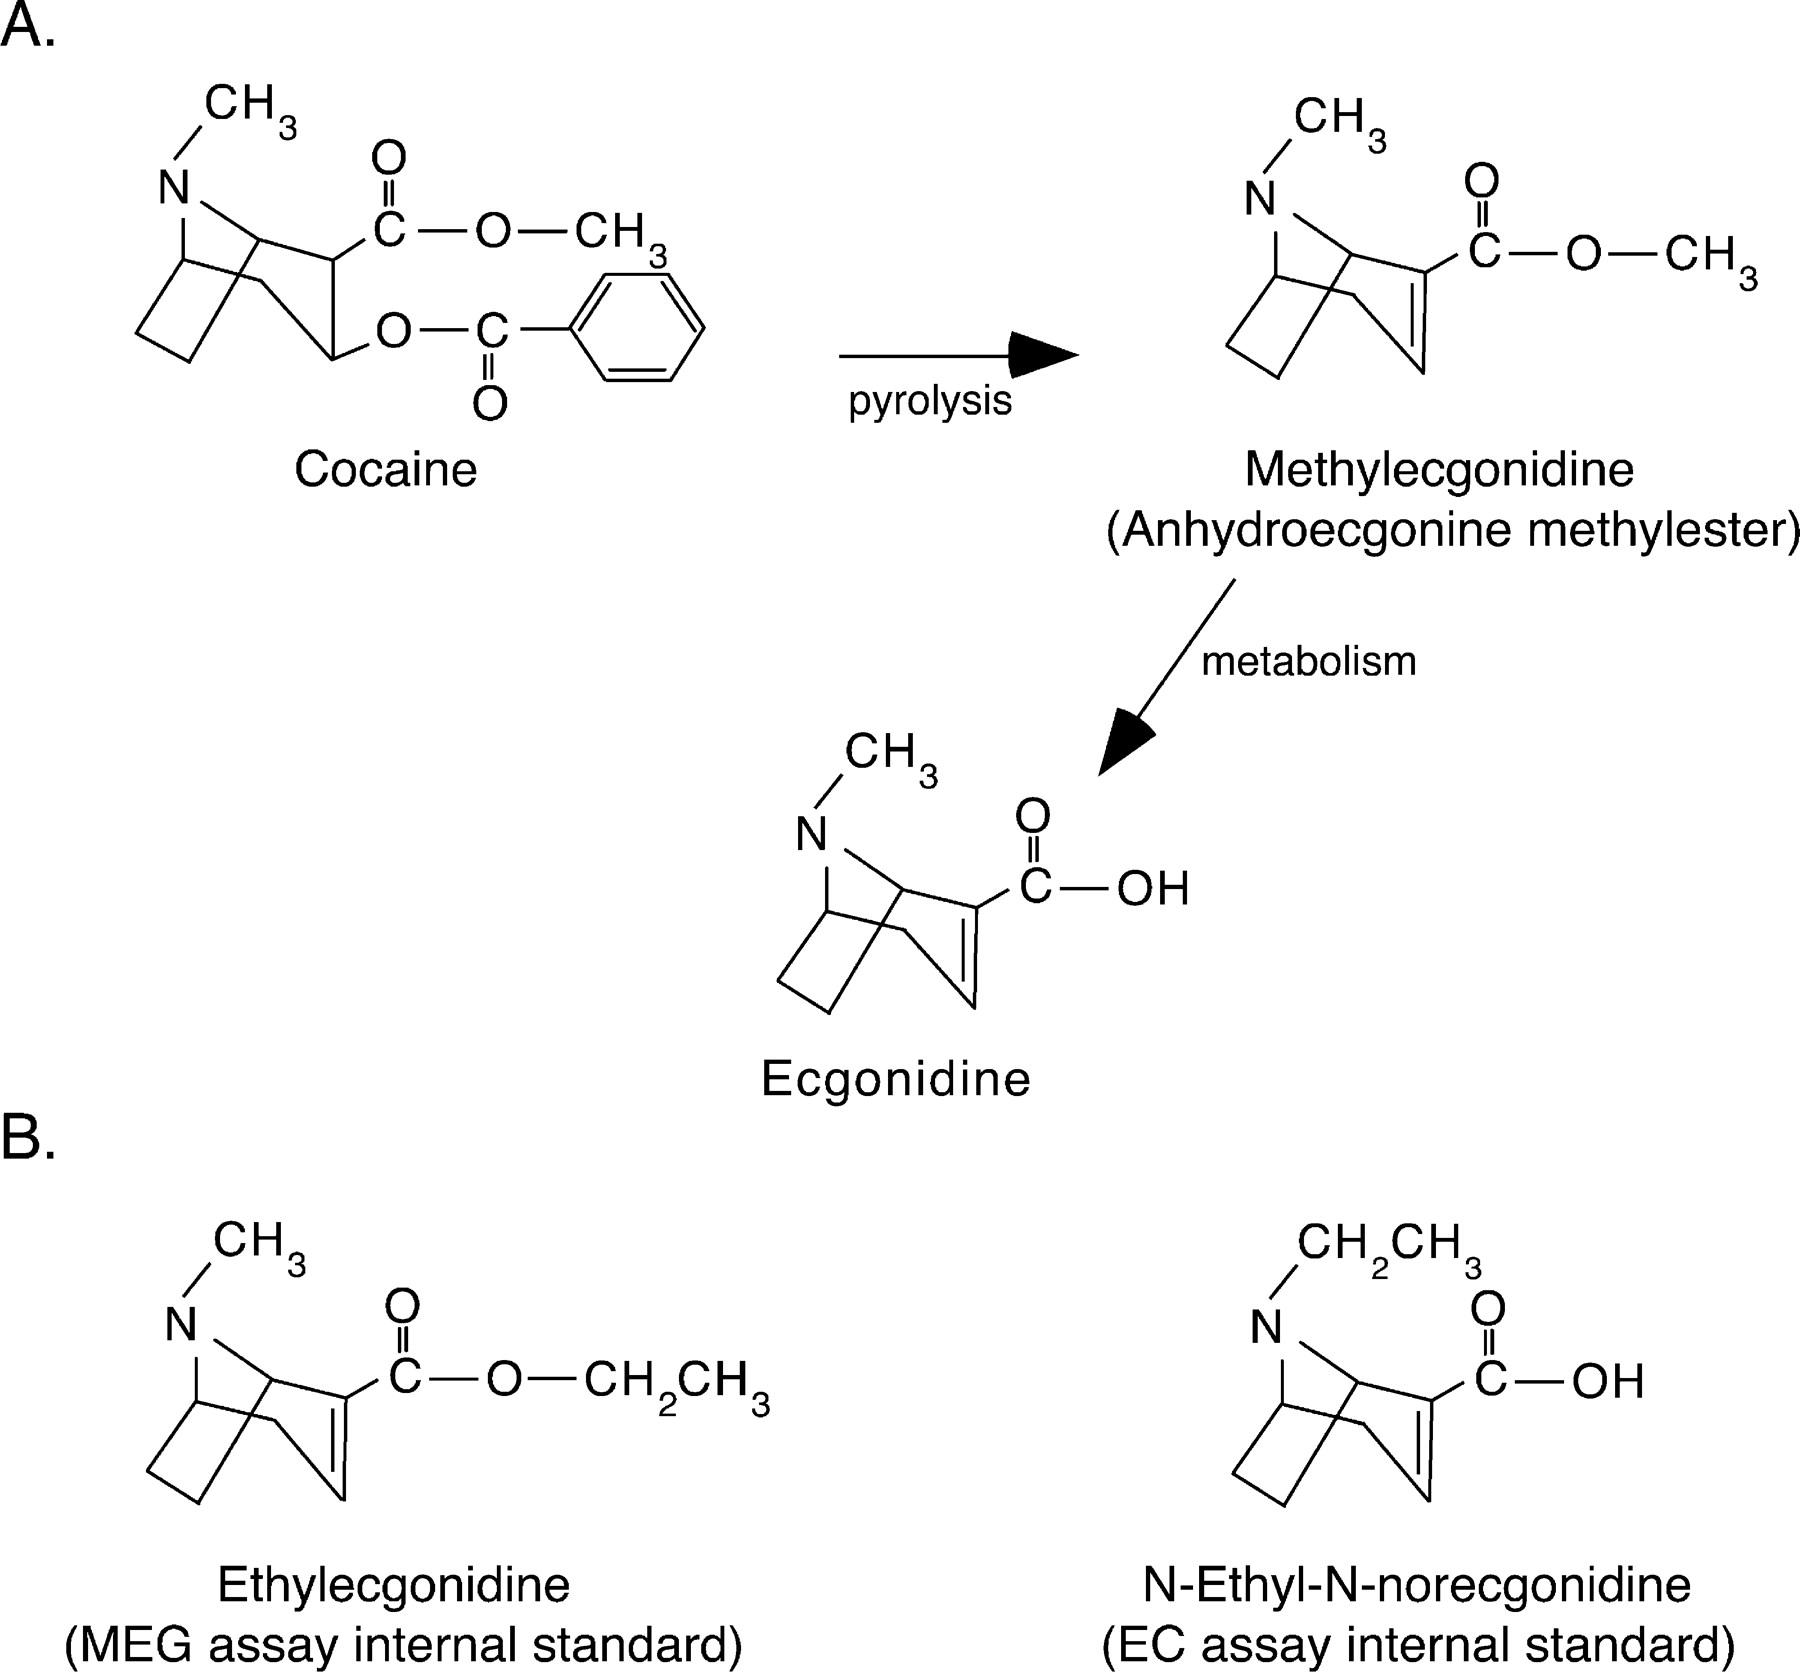 Pharmacokinetics and Pharmacodynamics of Methylecgonidine, a Crack